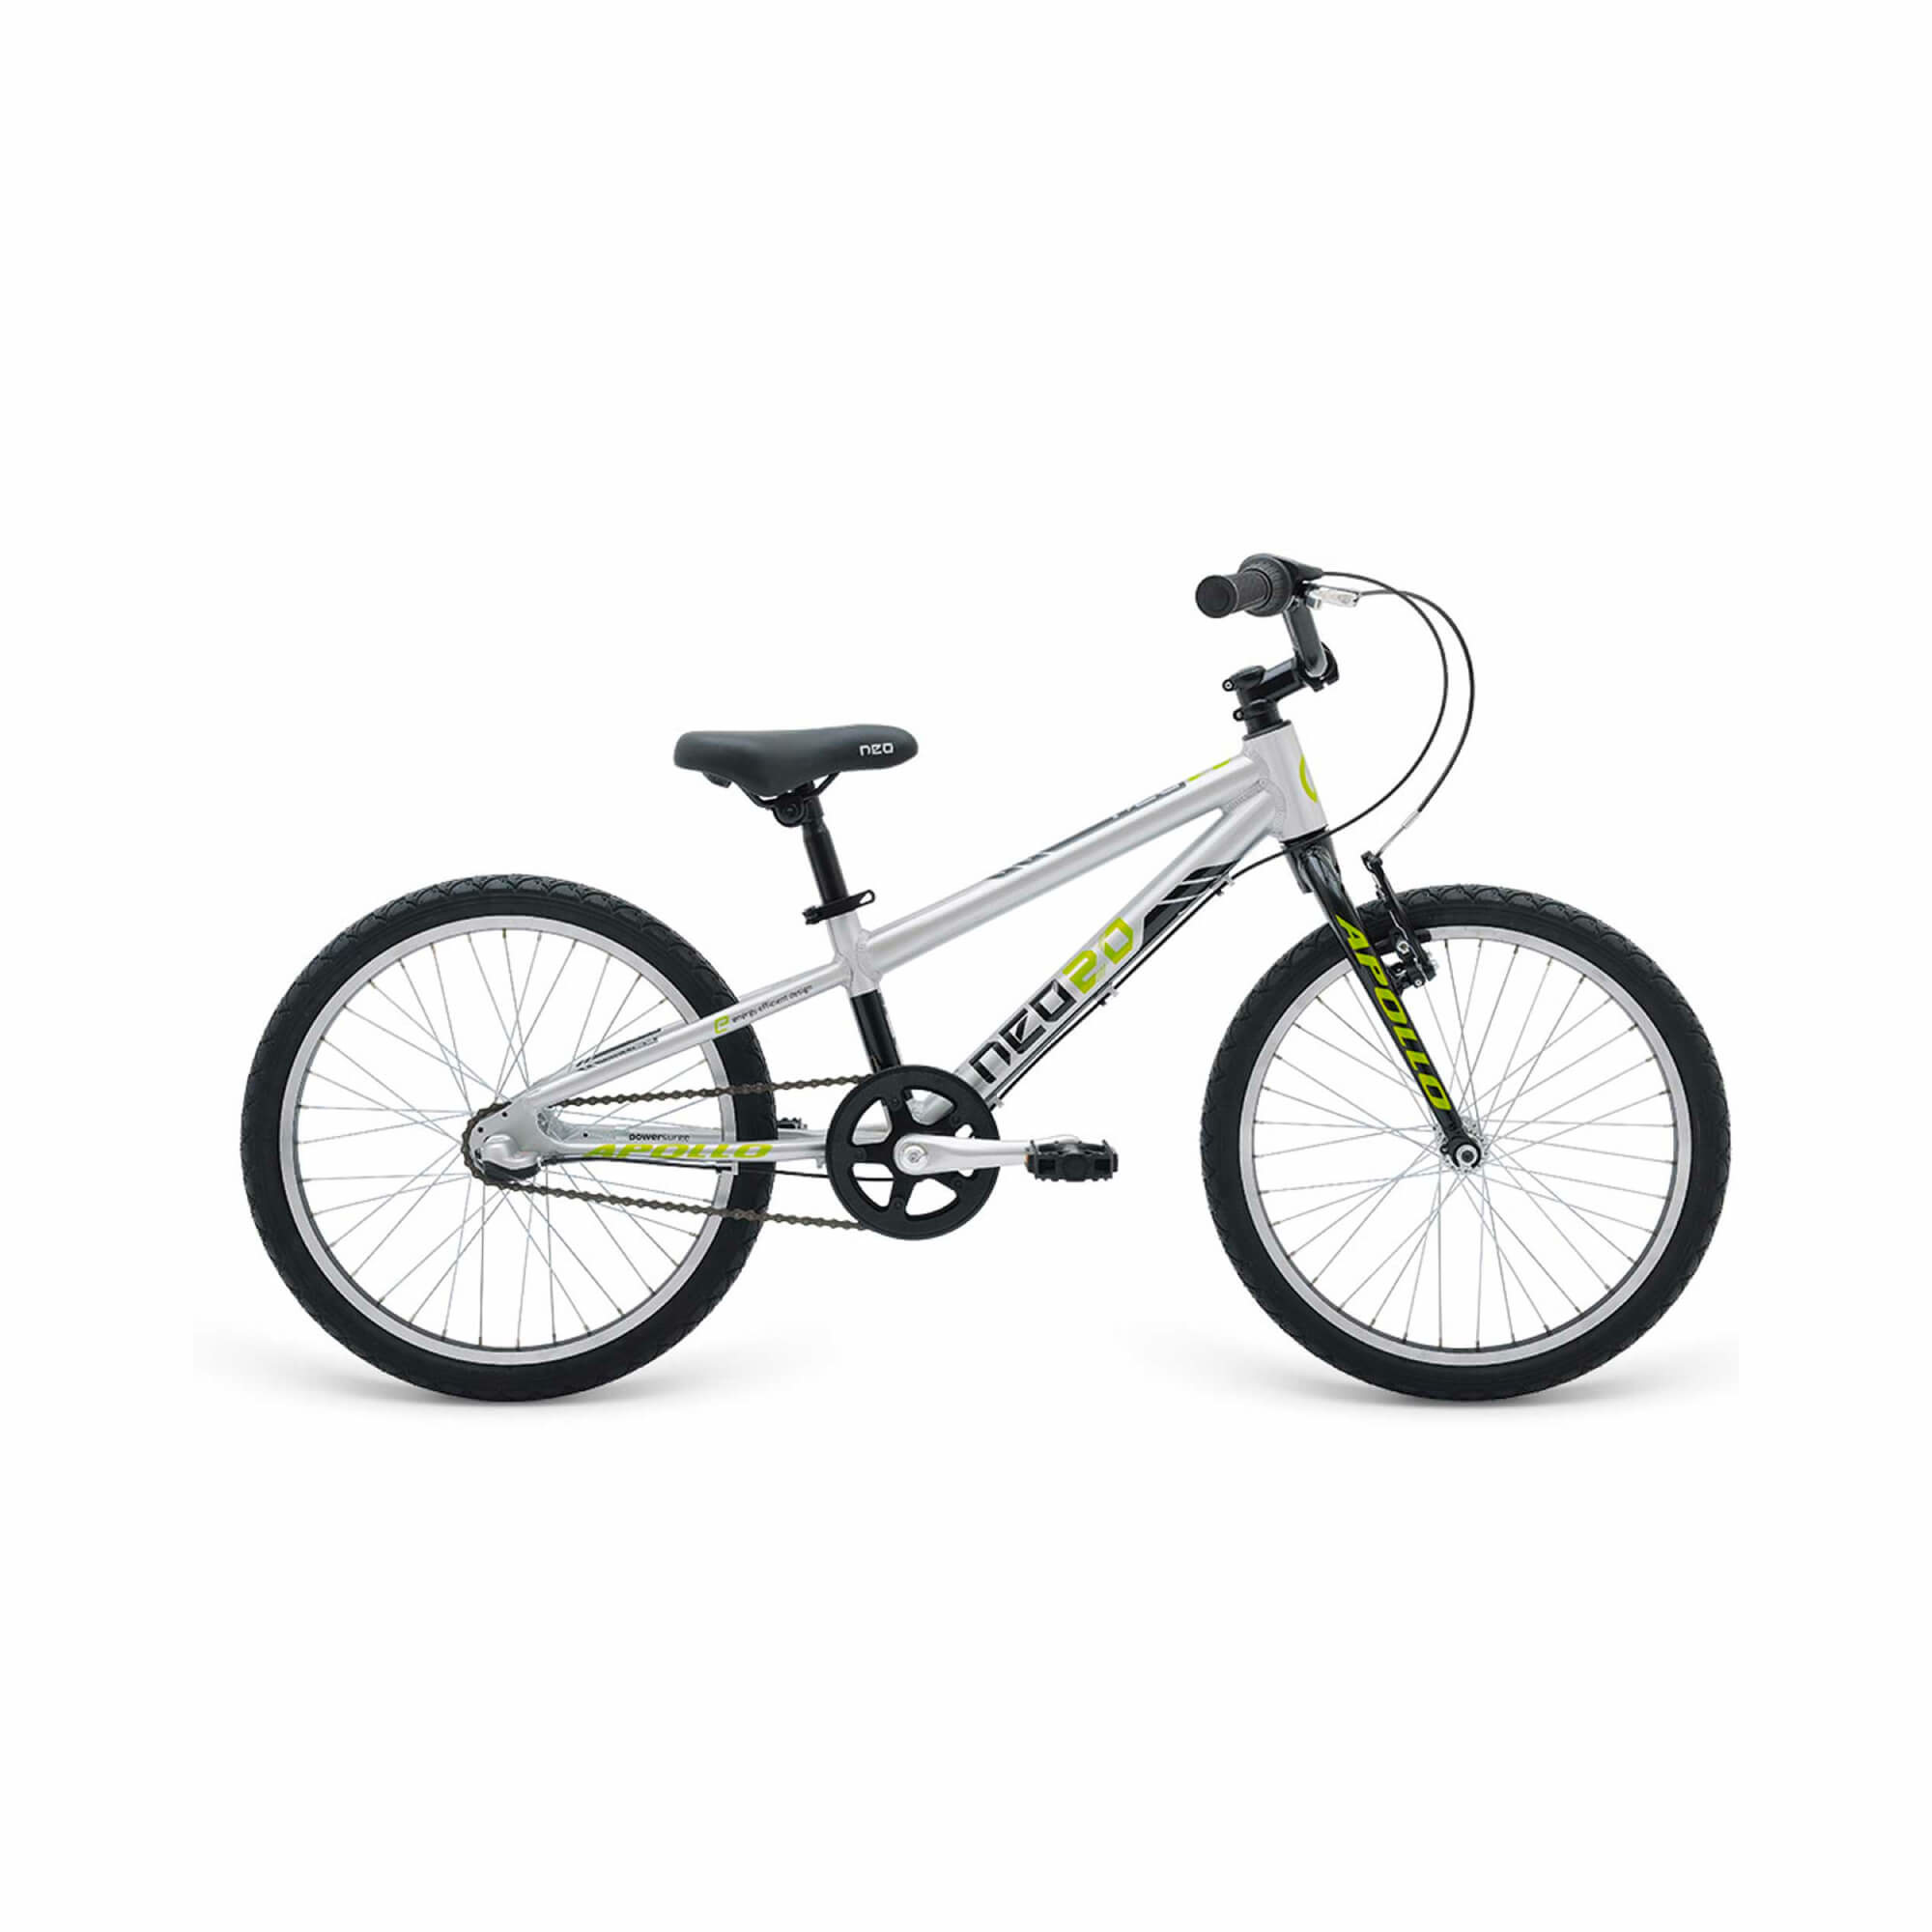 Boys Bike 20 3I Brushed Alloy/Black/Lime (3 Speed Internal)-1